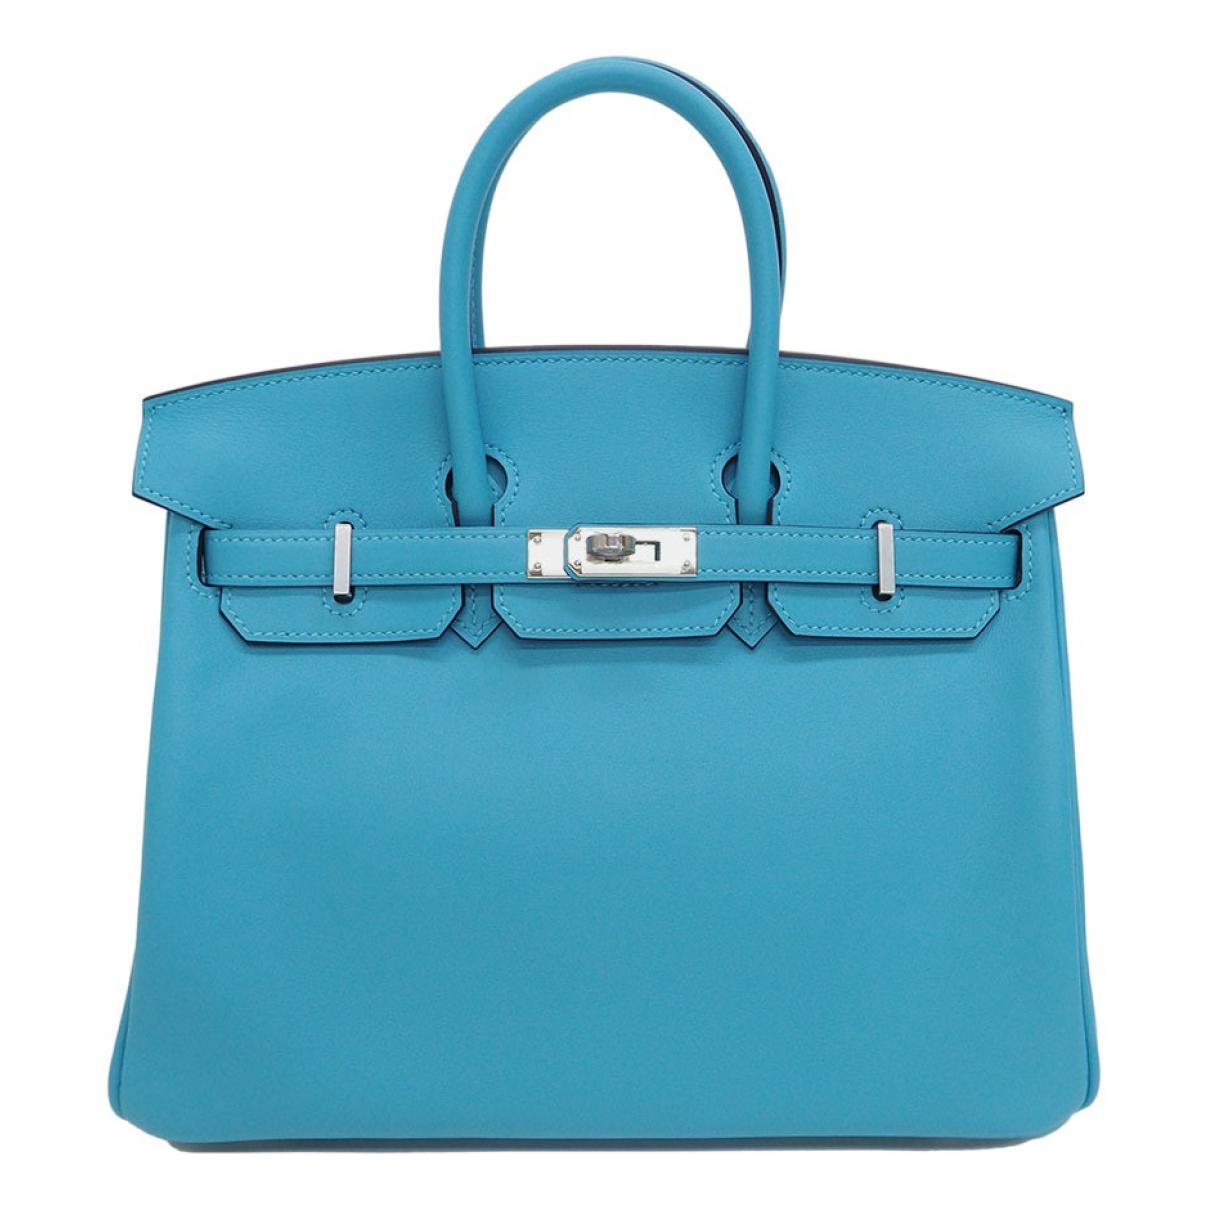 Hermes - Sac a main Birkin 30 pour femme en cuir - bleu